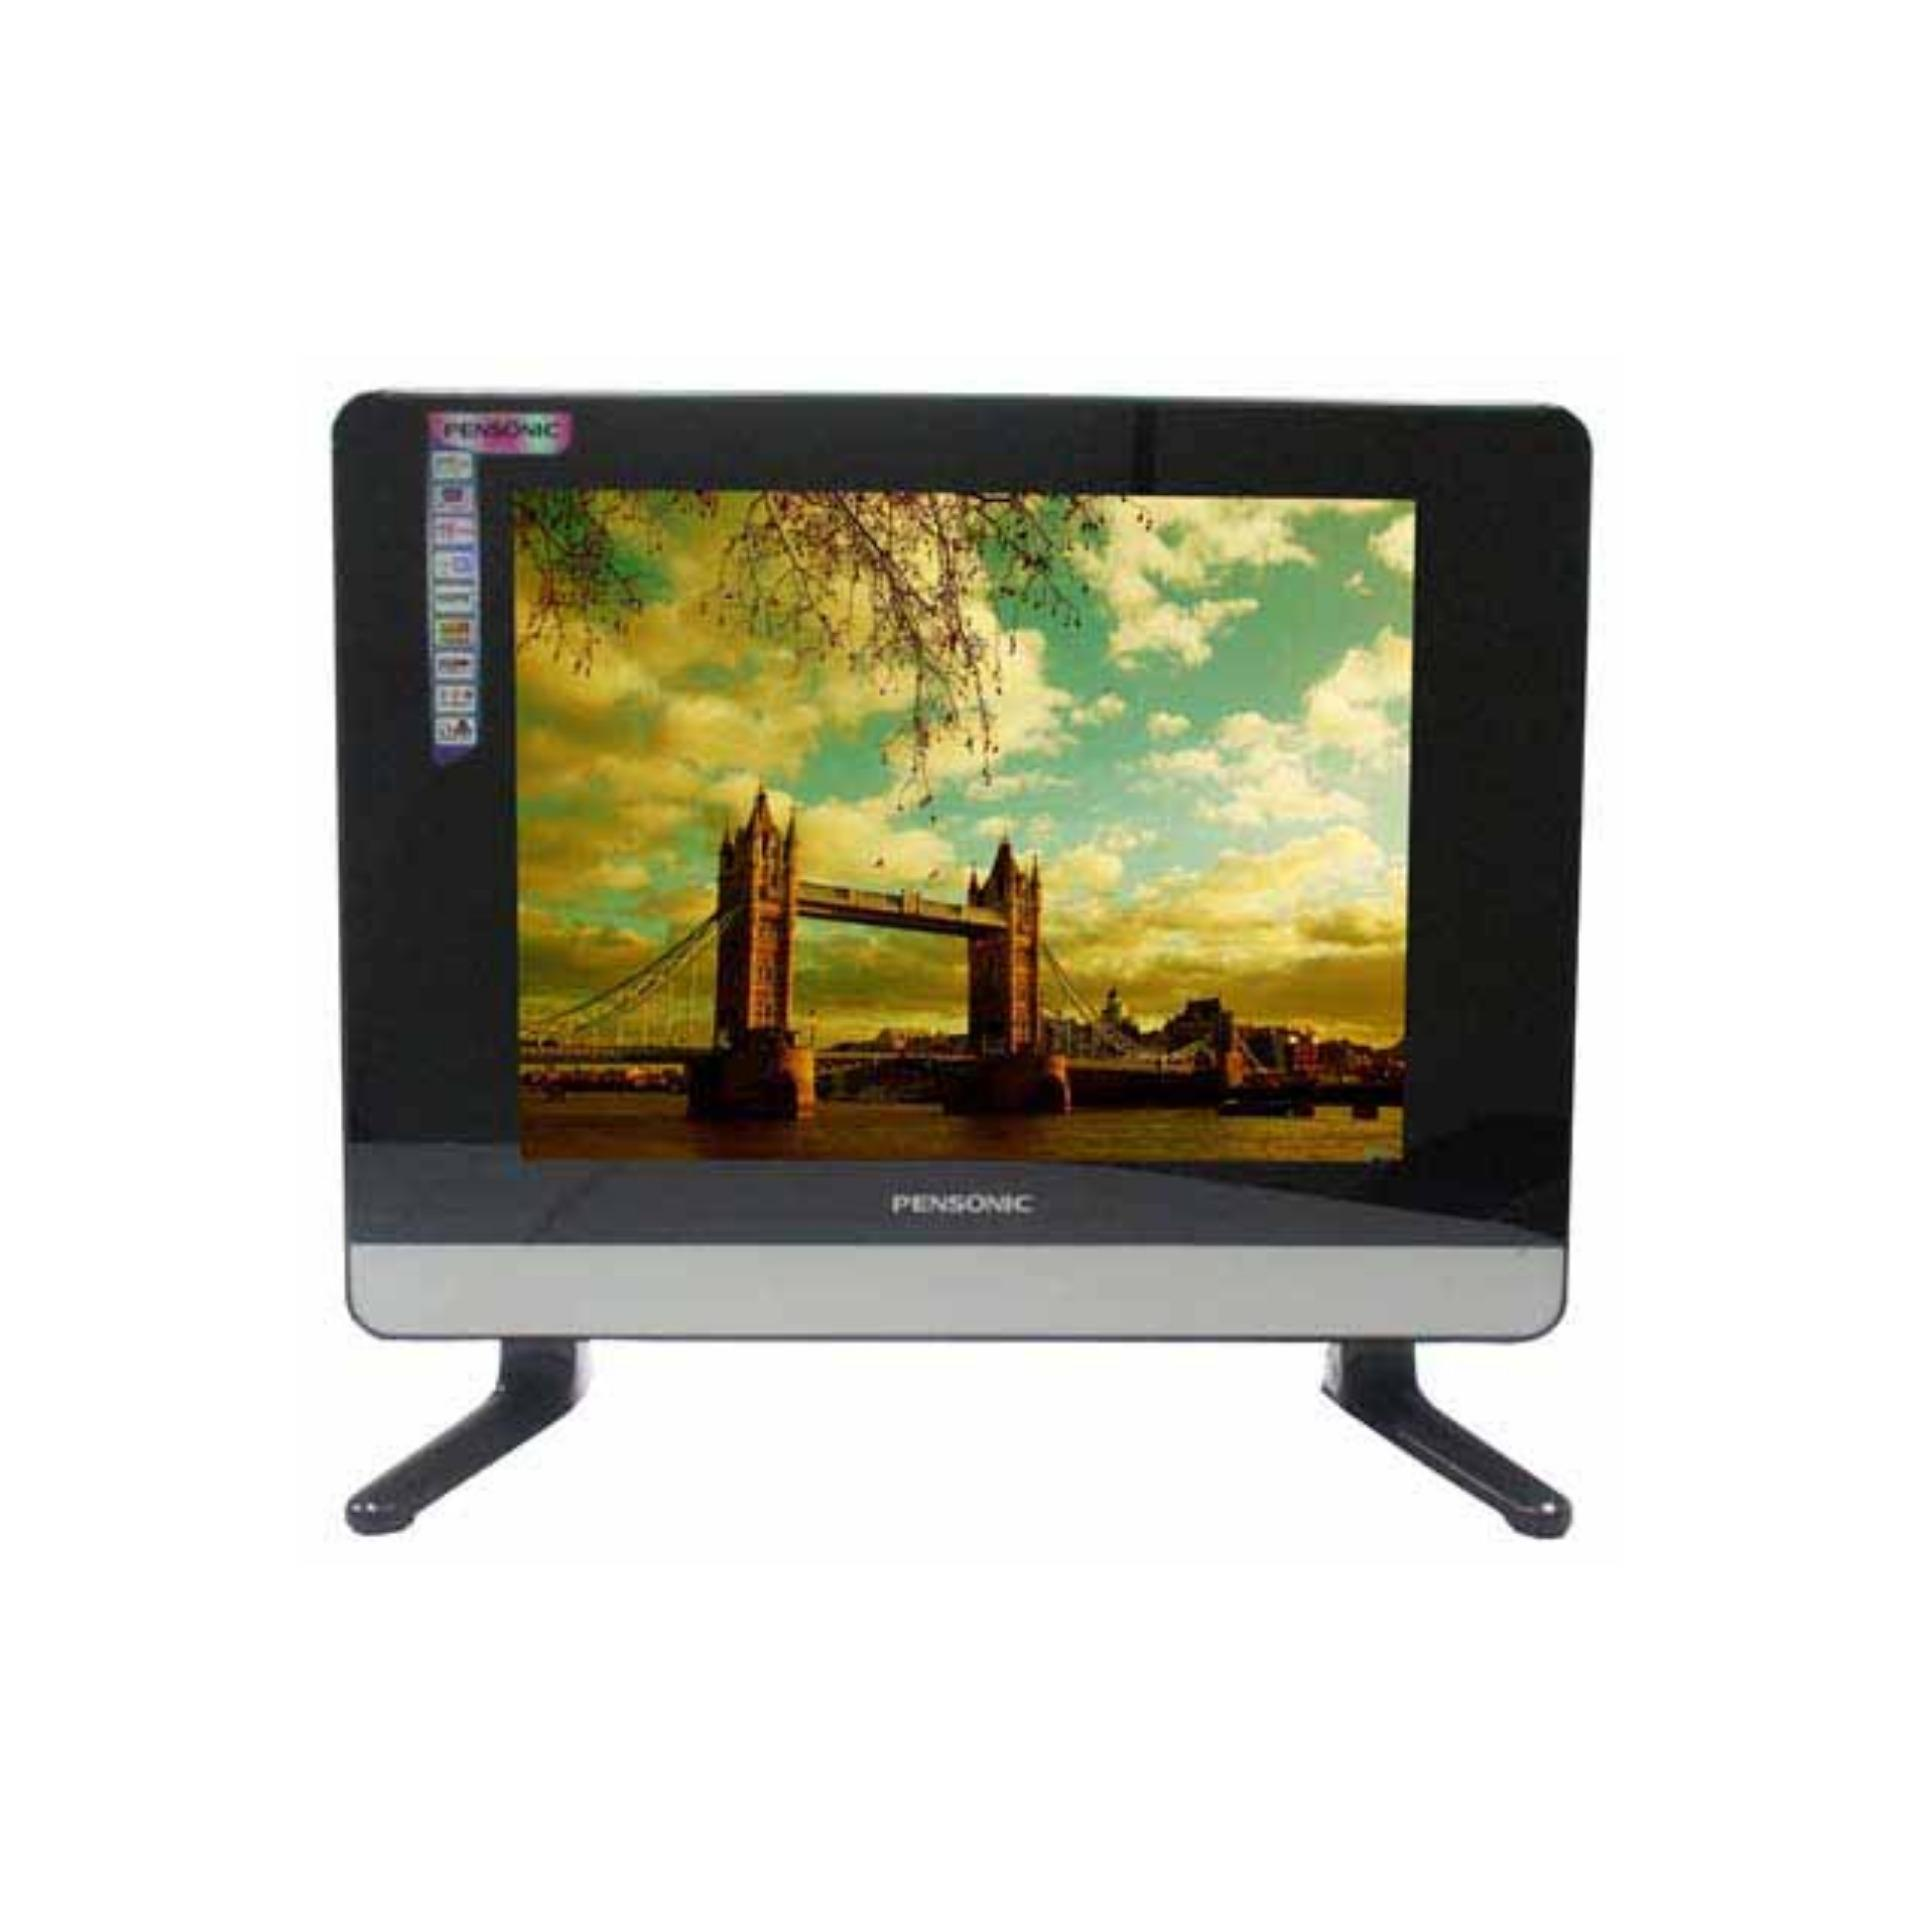 Pensonic Philippines Pensonic Price List Pensonic Dvd Player  # Meuble Tv Kaorka